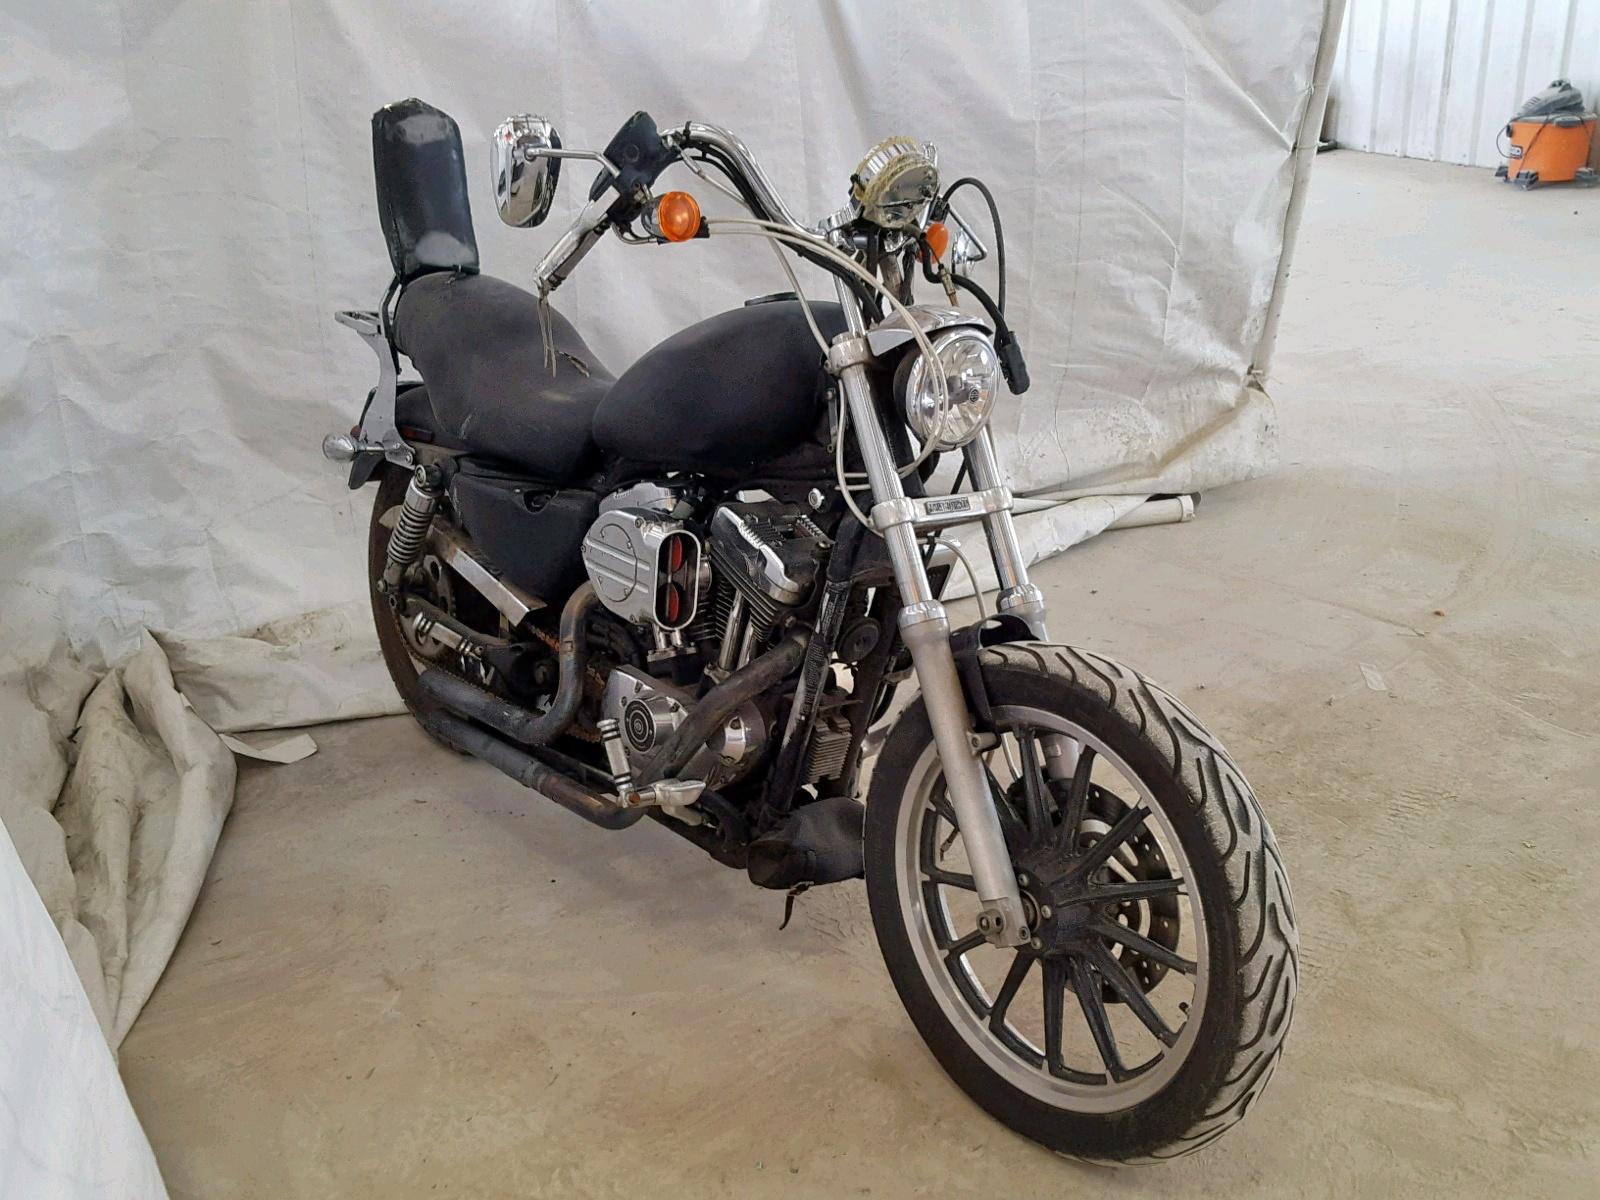 Salvage 2008 Harley-Davidson XL1200 L for sale